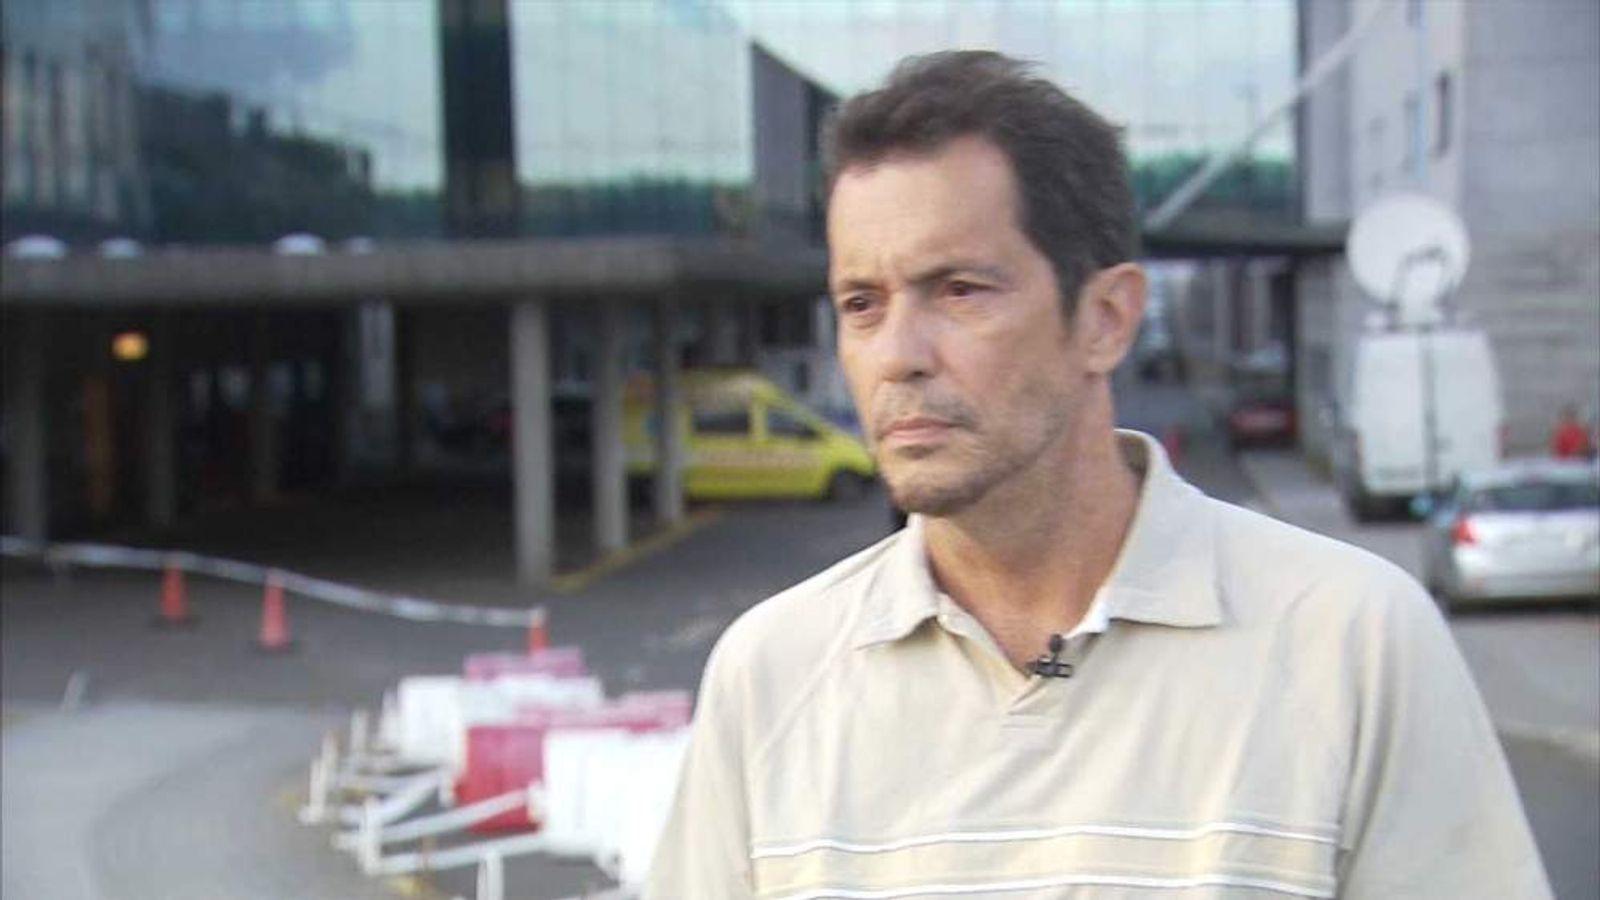 Spain train crash survivor Robert Fariza